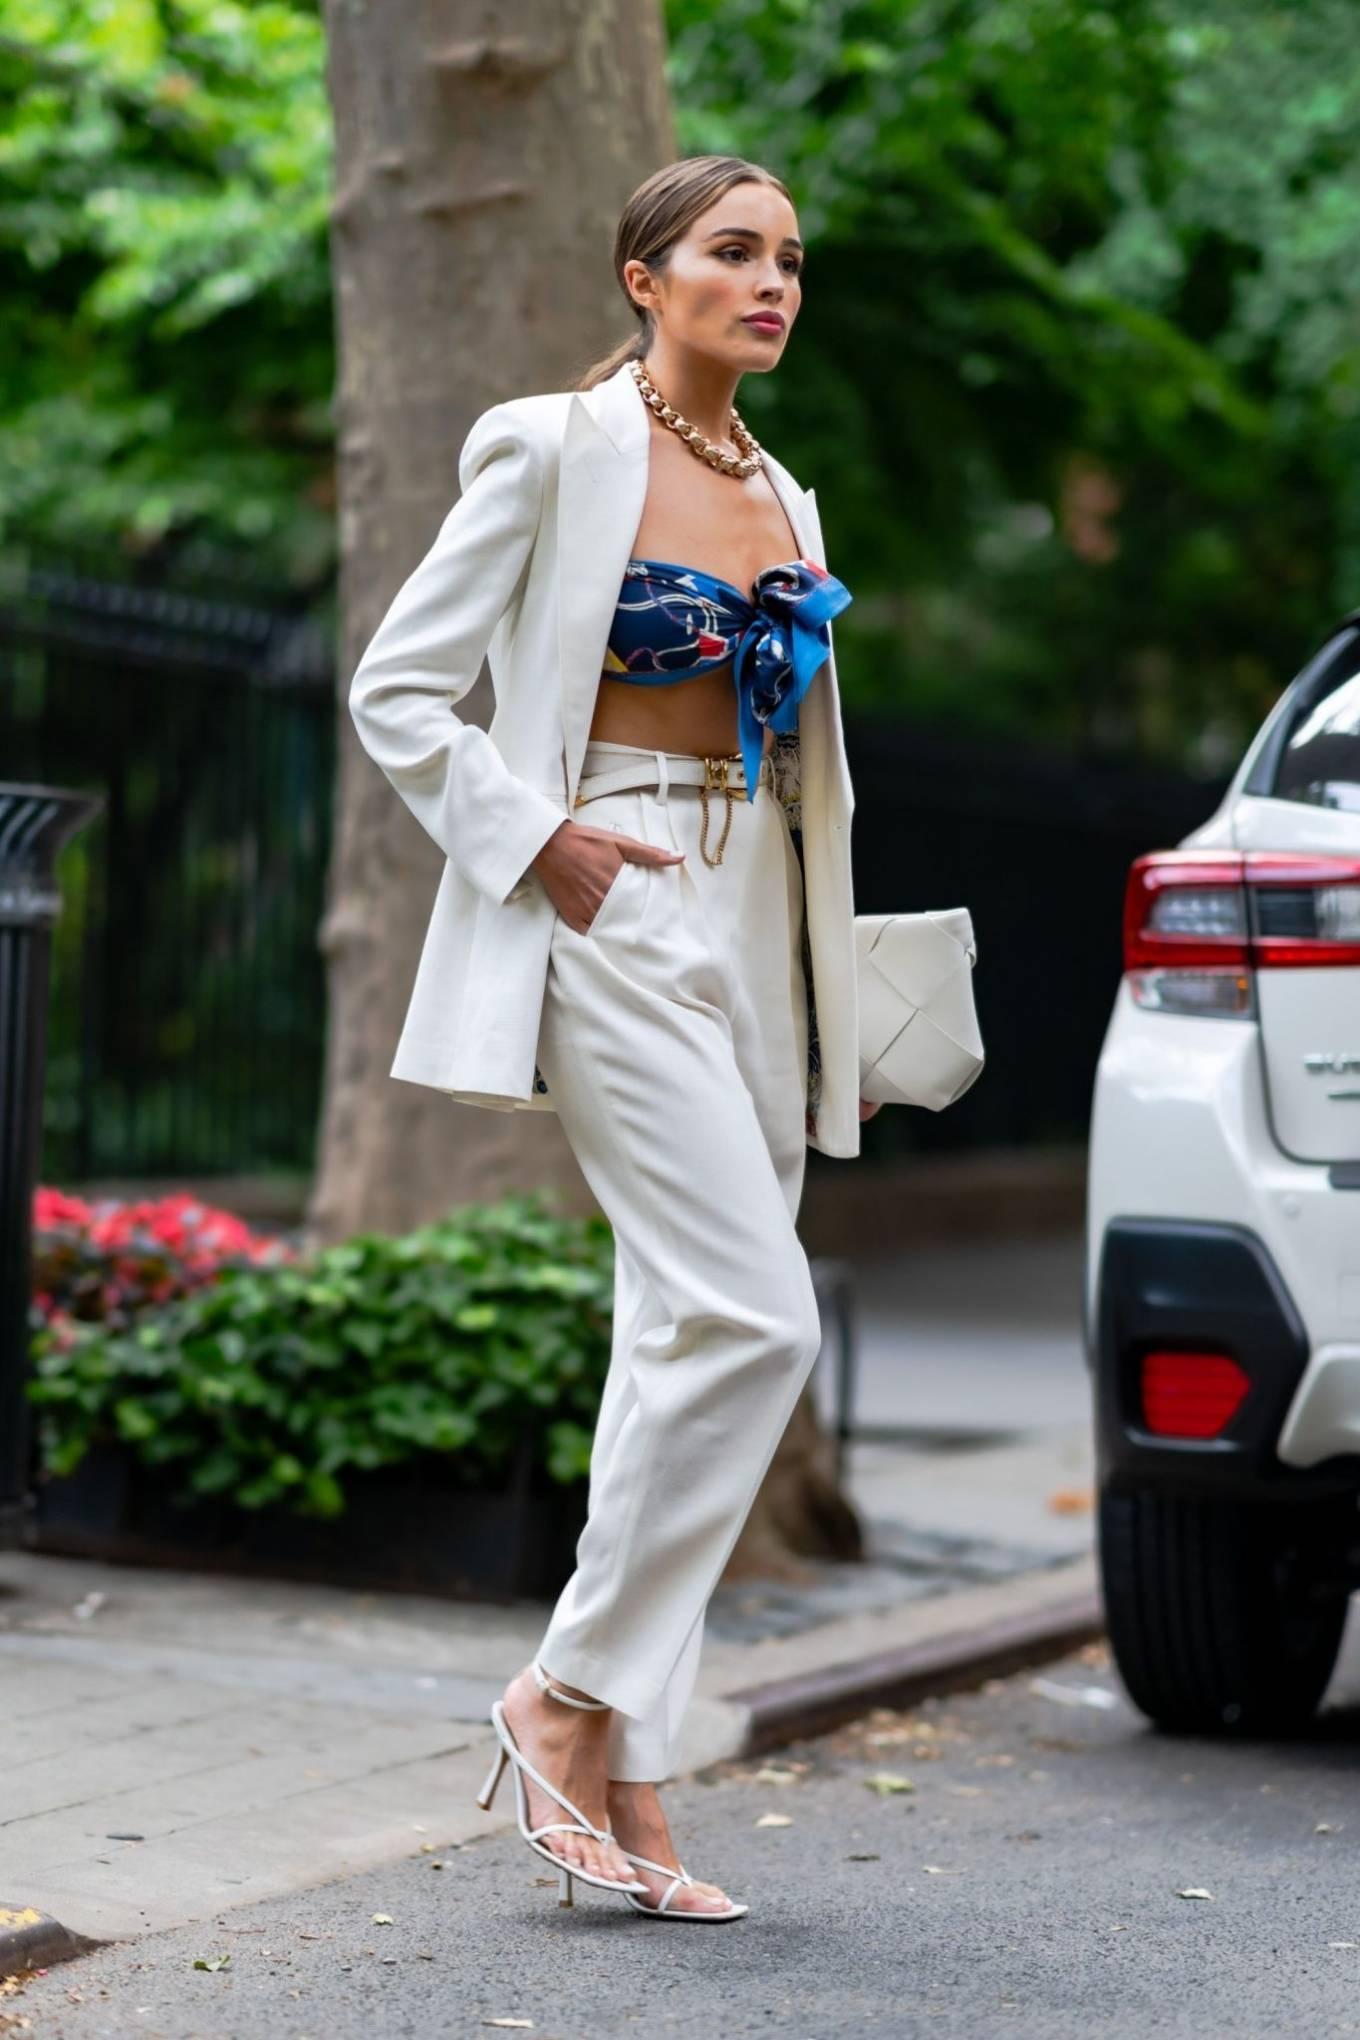 Olivia Culpo - Wearing Etro and Bottega Veneta in Gramercy Park in NYC